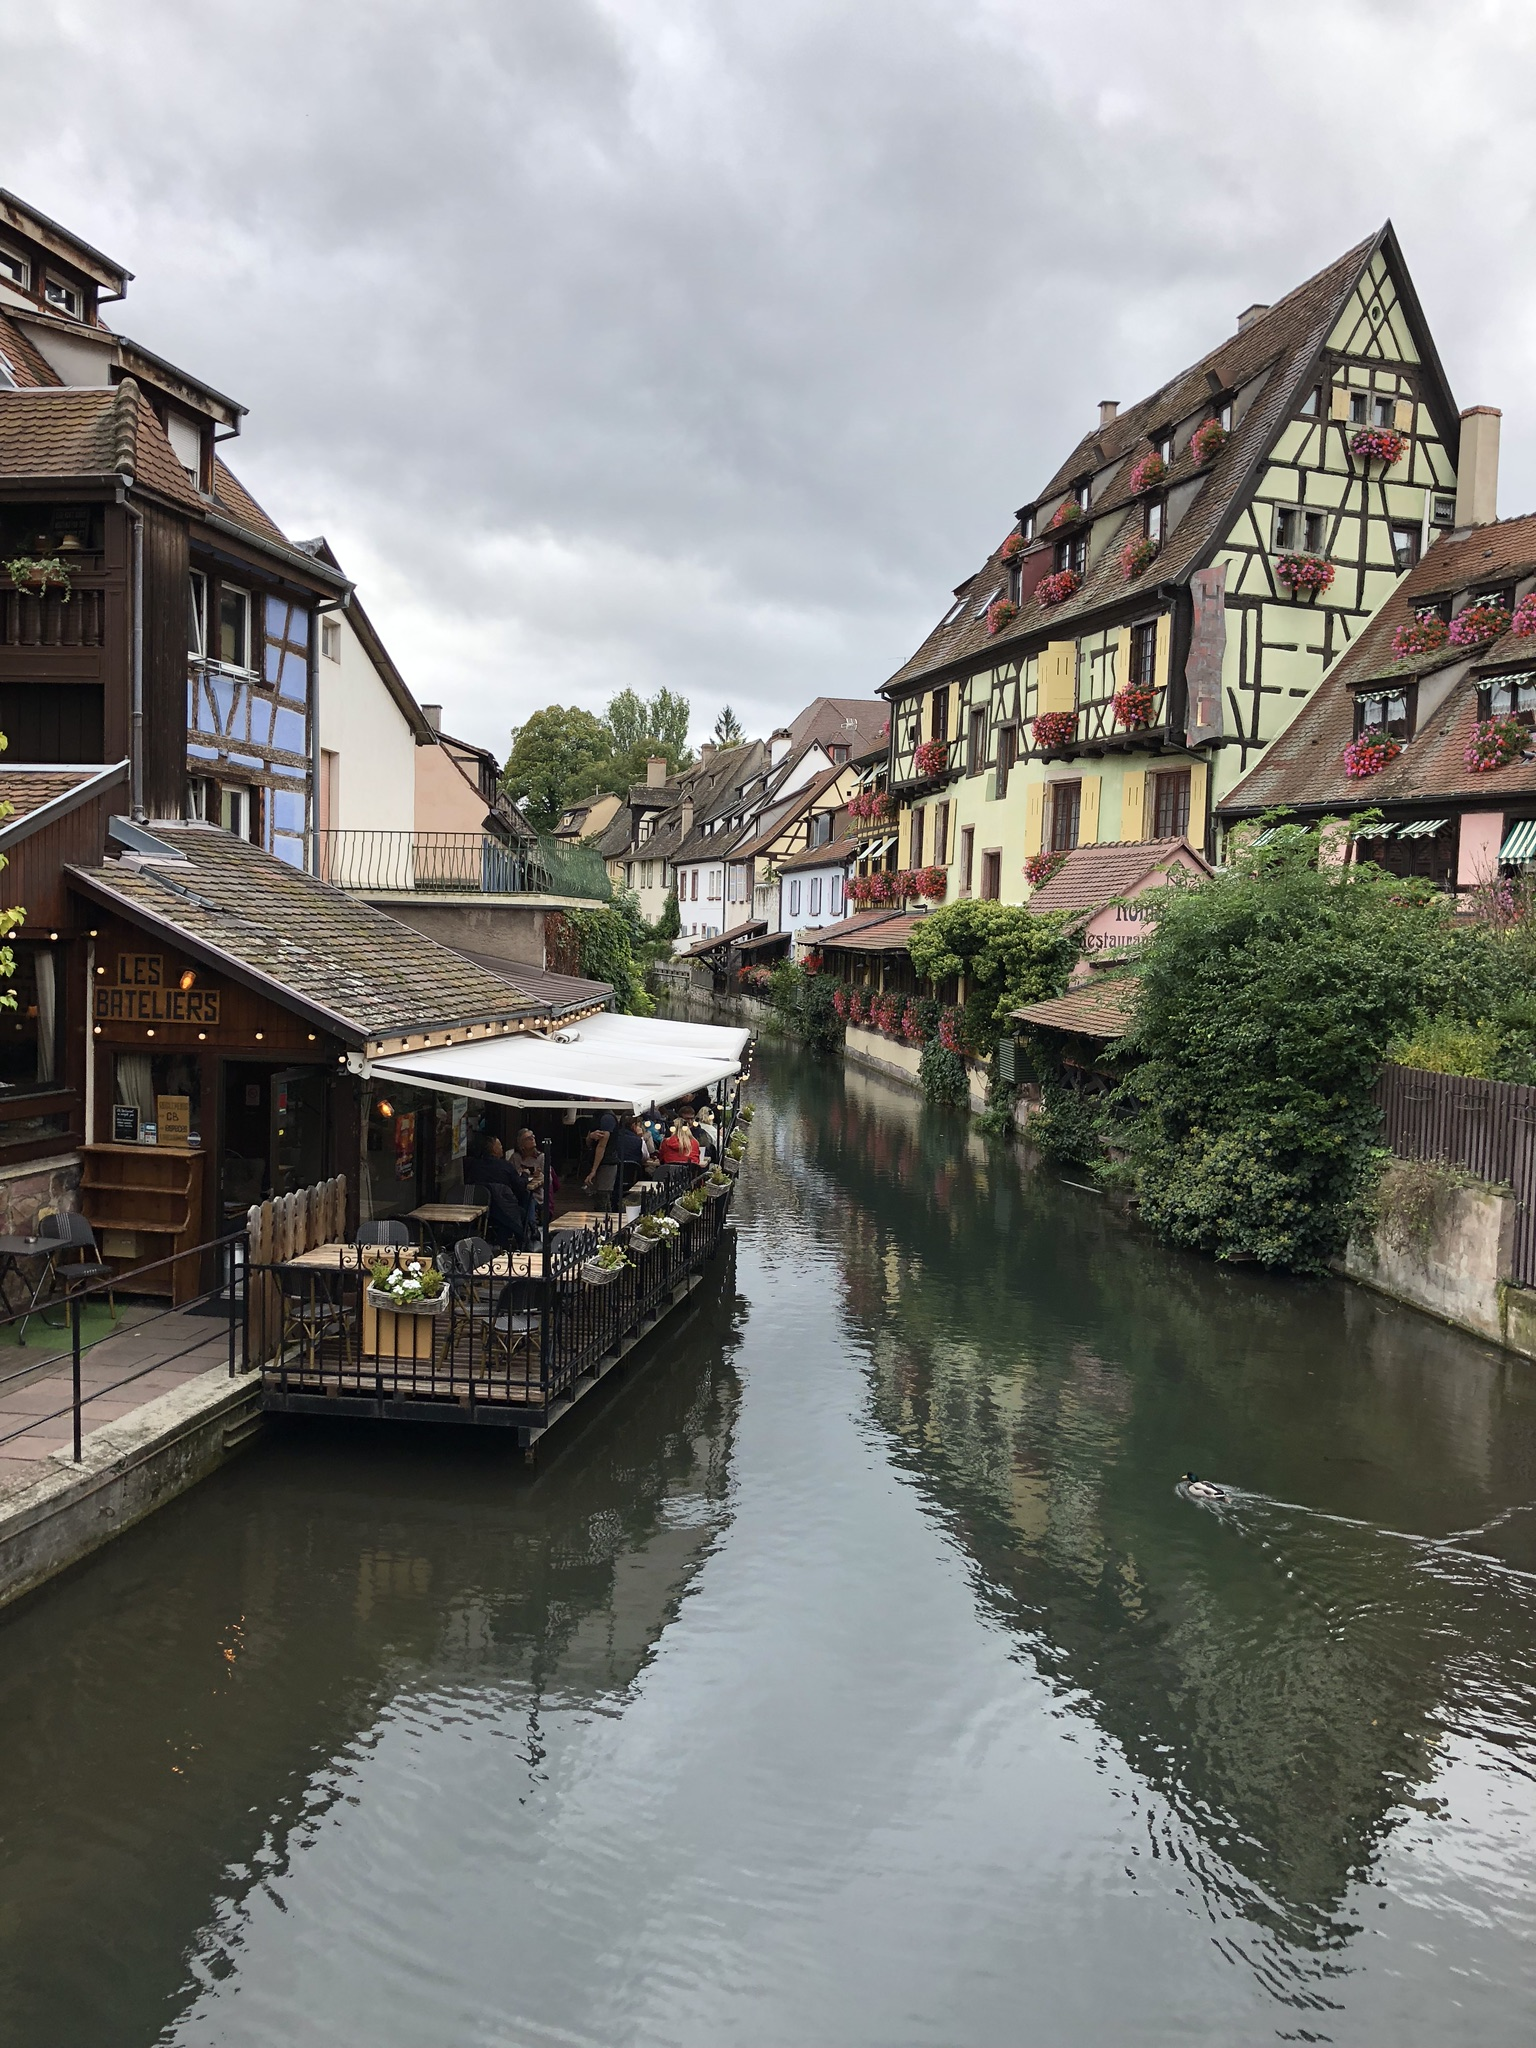 Kanal in Colmar, Elsass